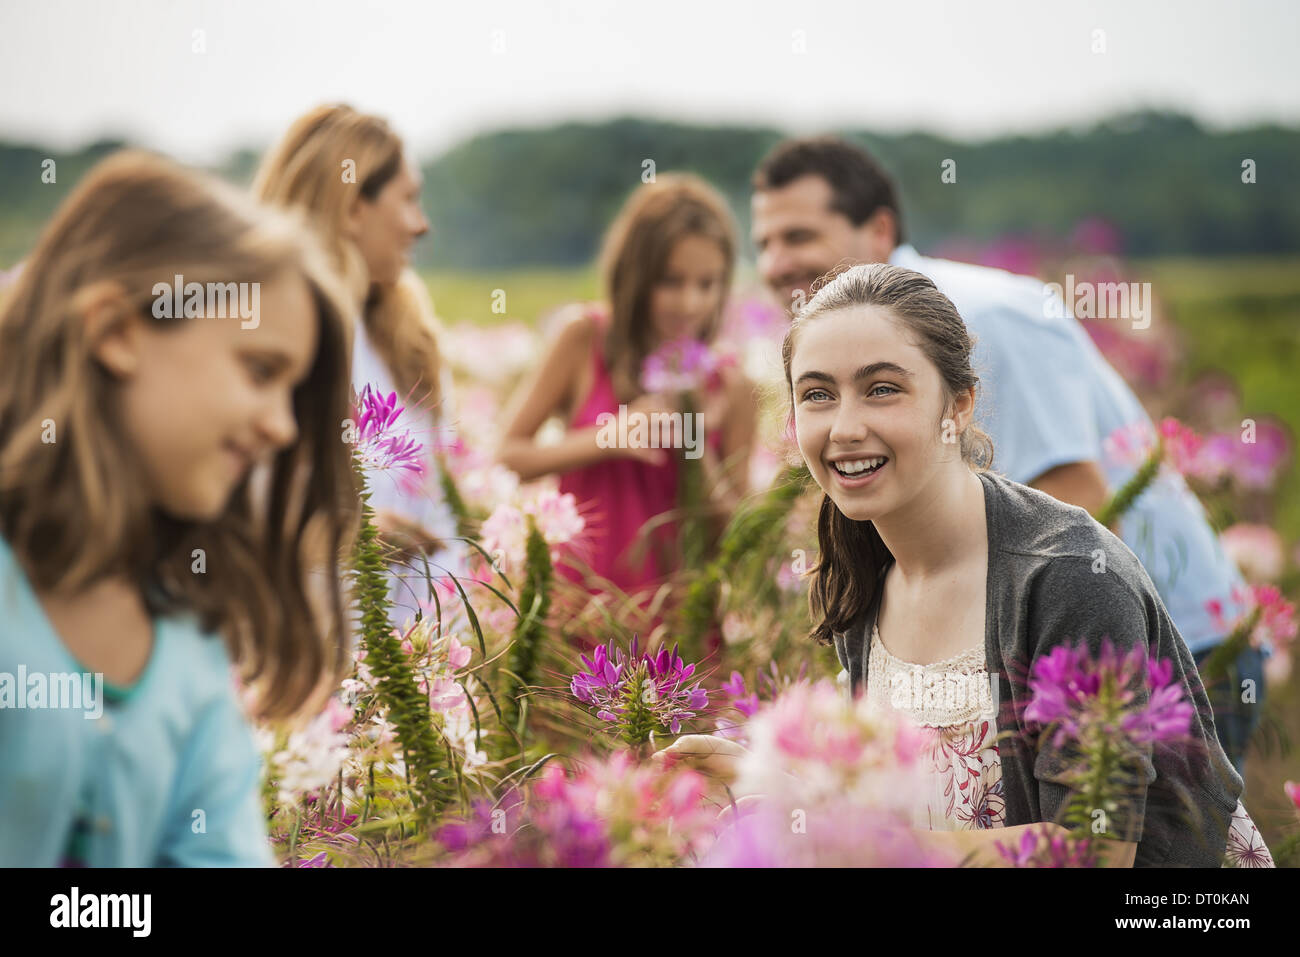 Woodstock New York USA group of people among flowers organic Flower Farm - Stock Image